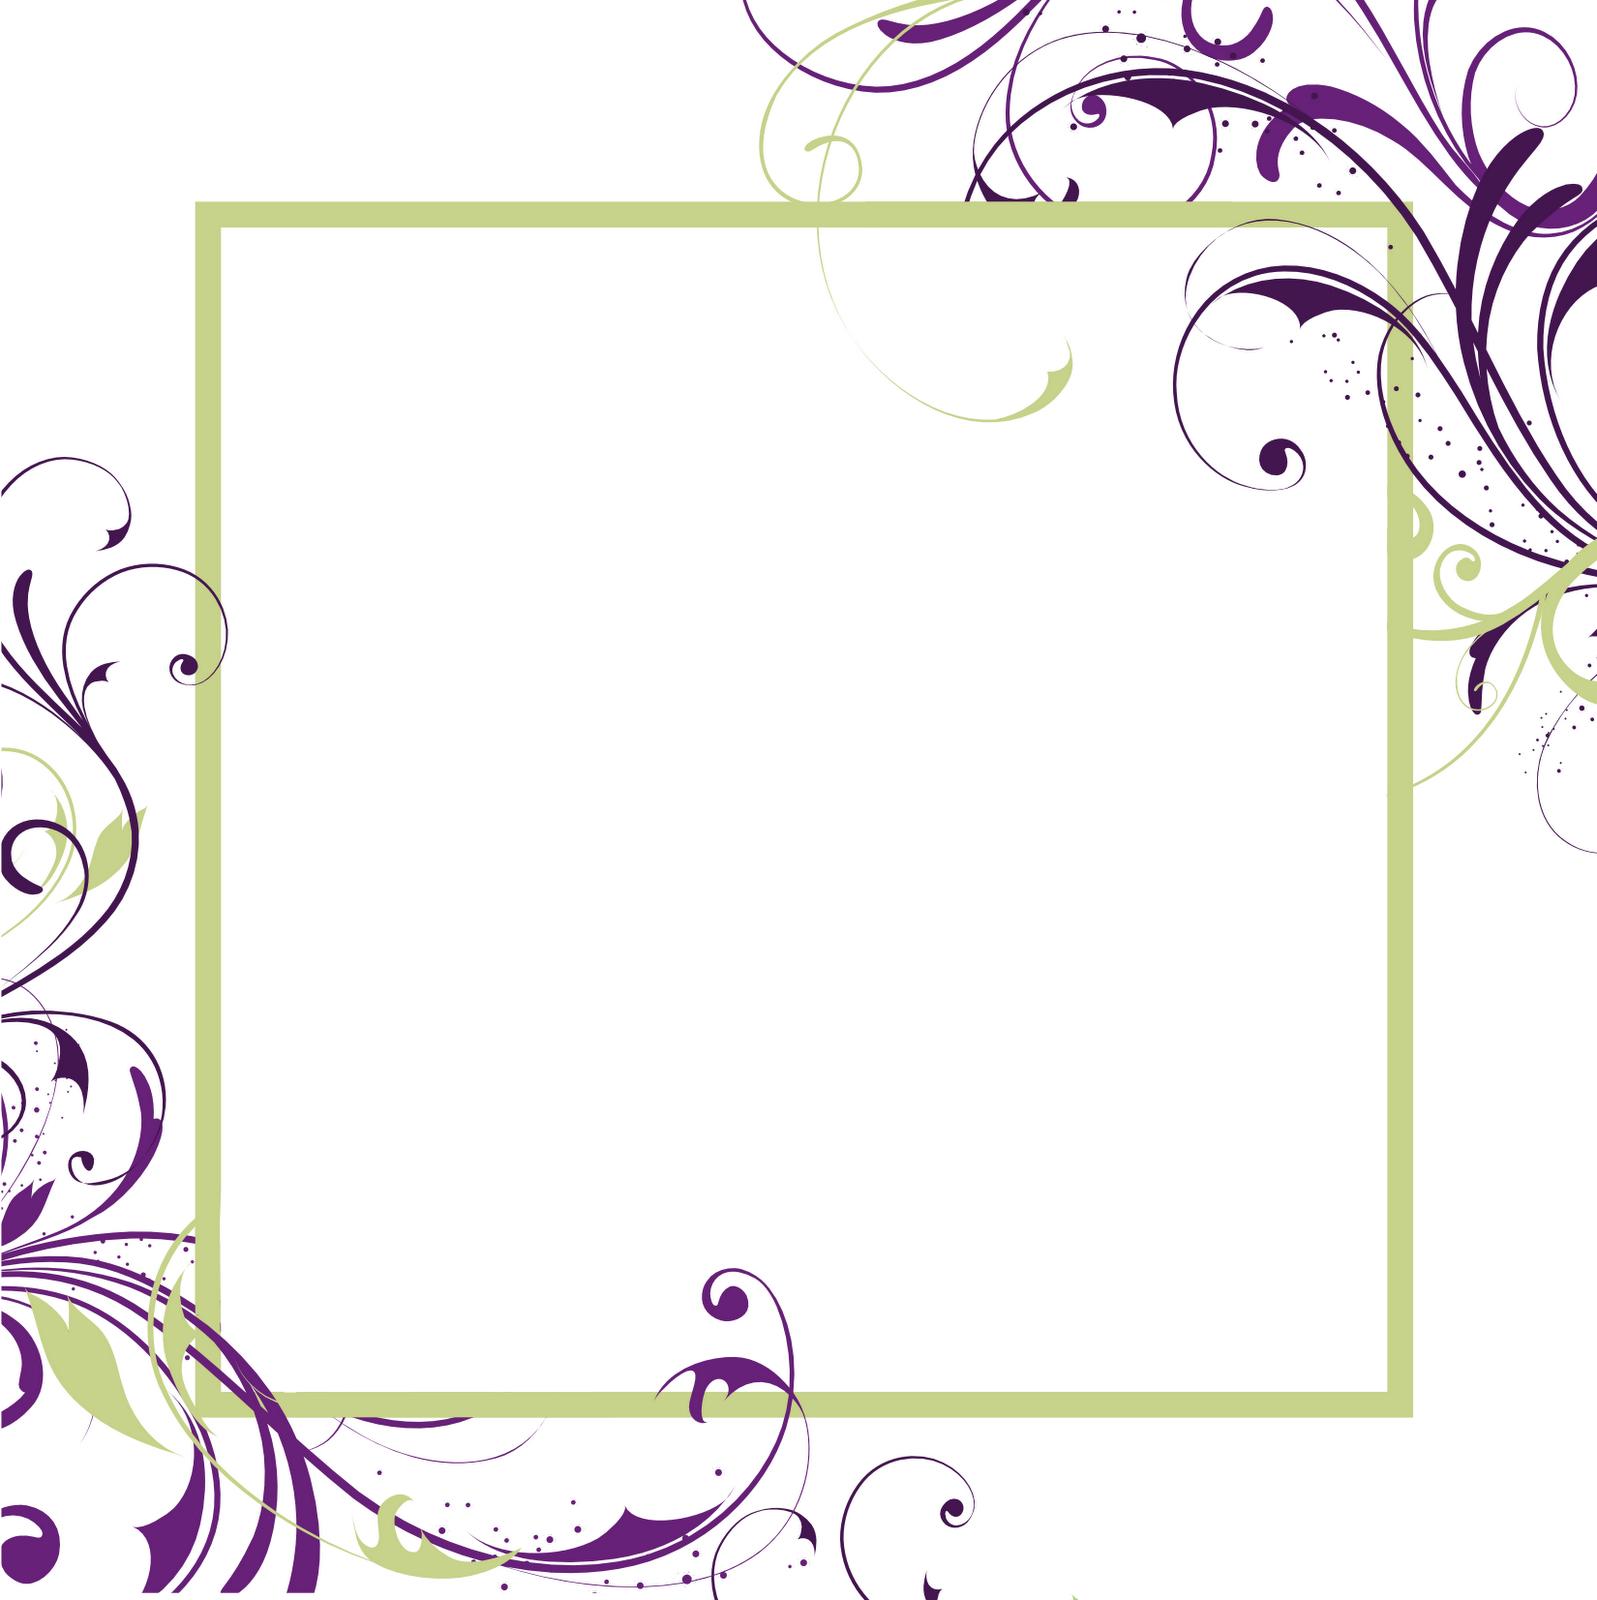 Free Printable Blank Invitations Templates   Wedding Invite Template - Wedding Invitation Cards Printable Free